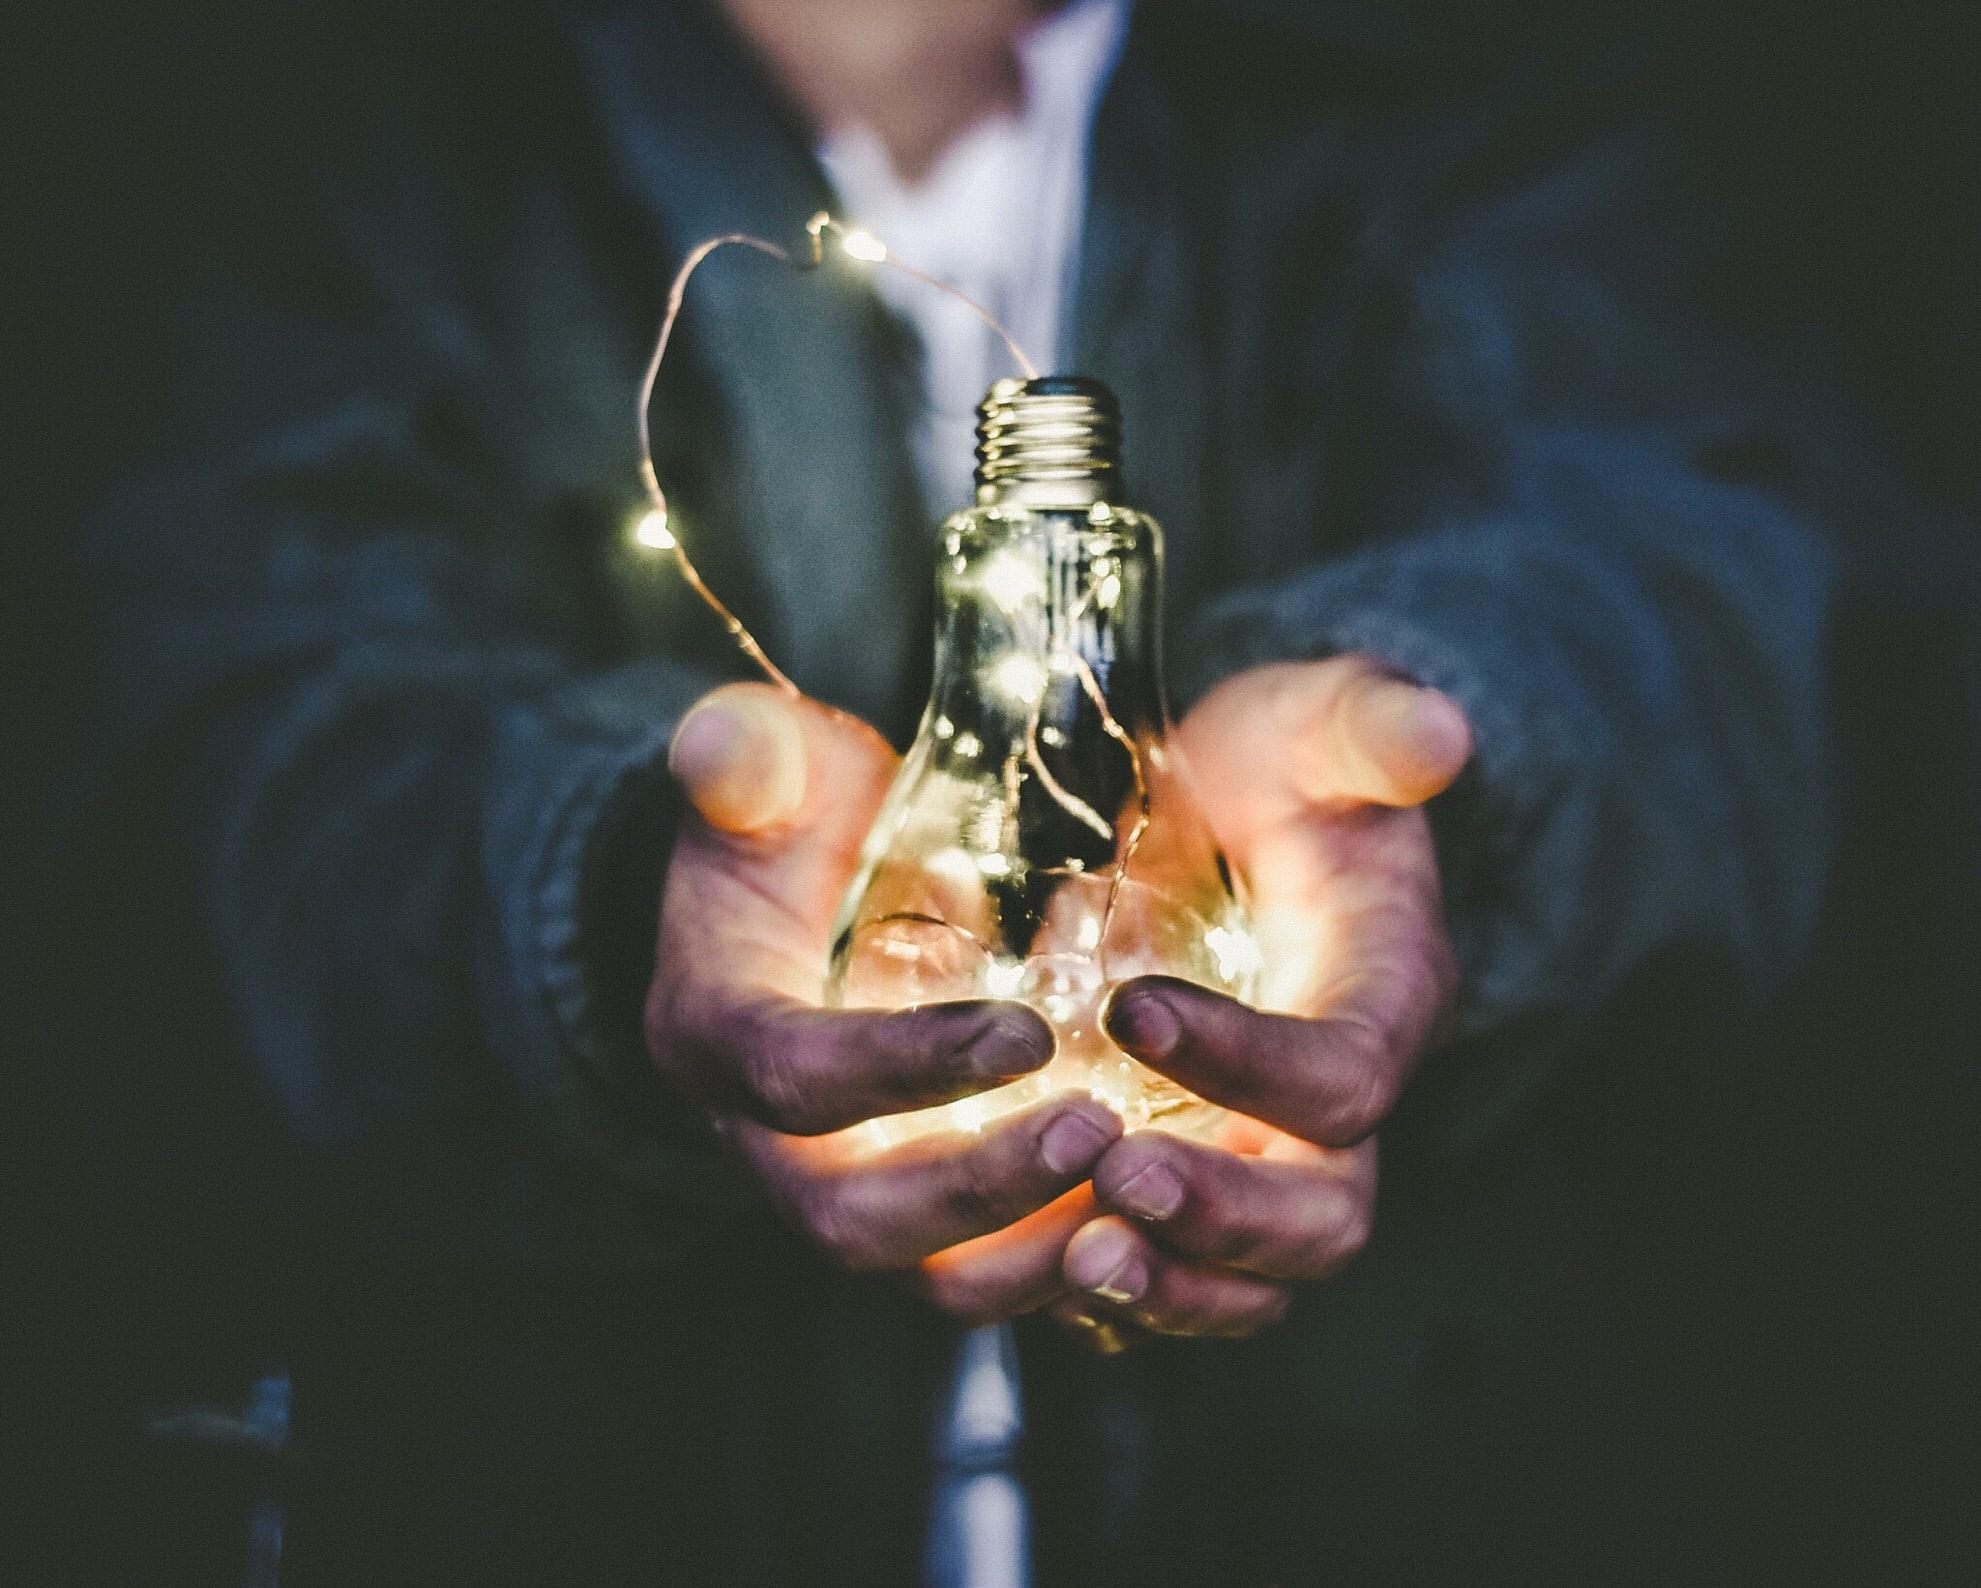 Innovate bulb in hand